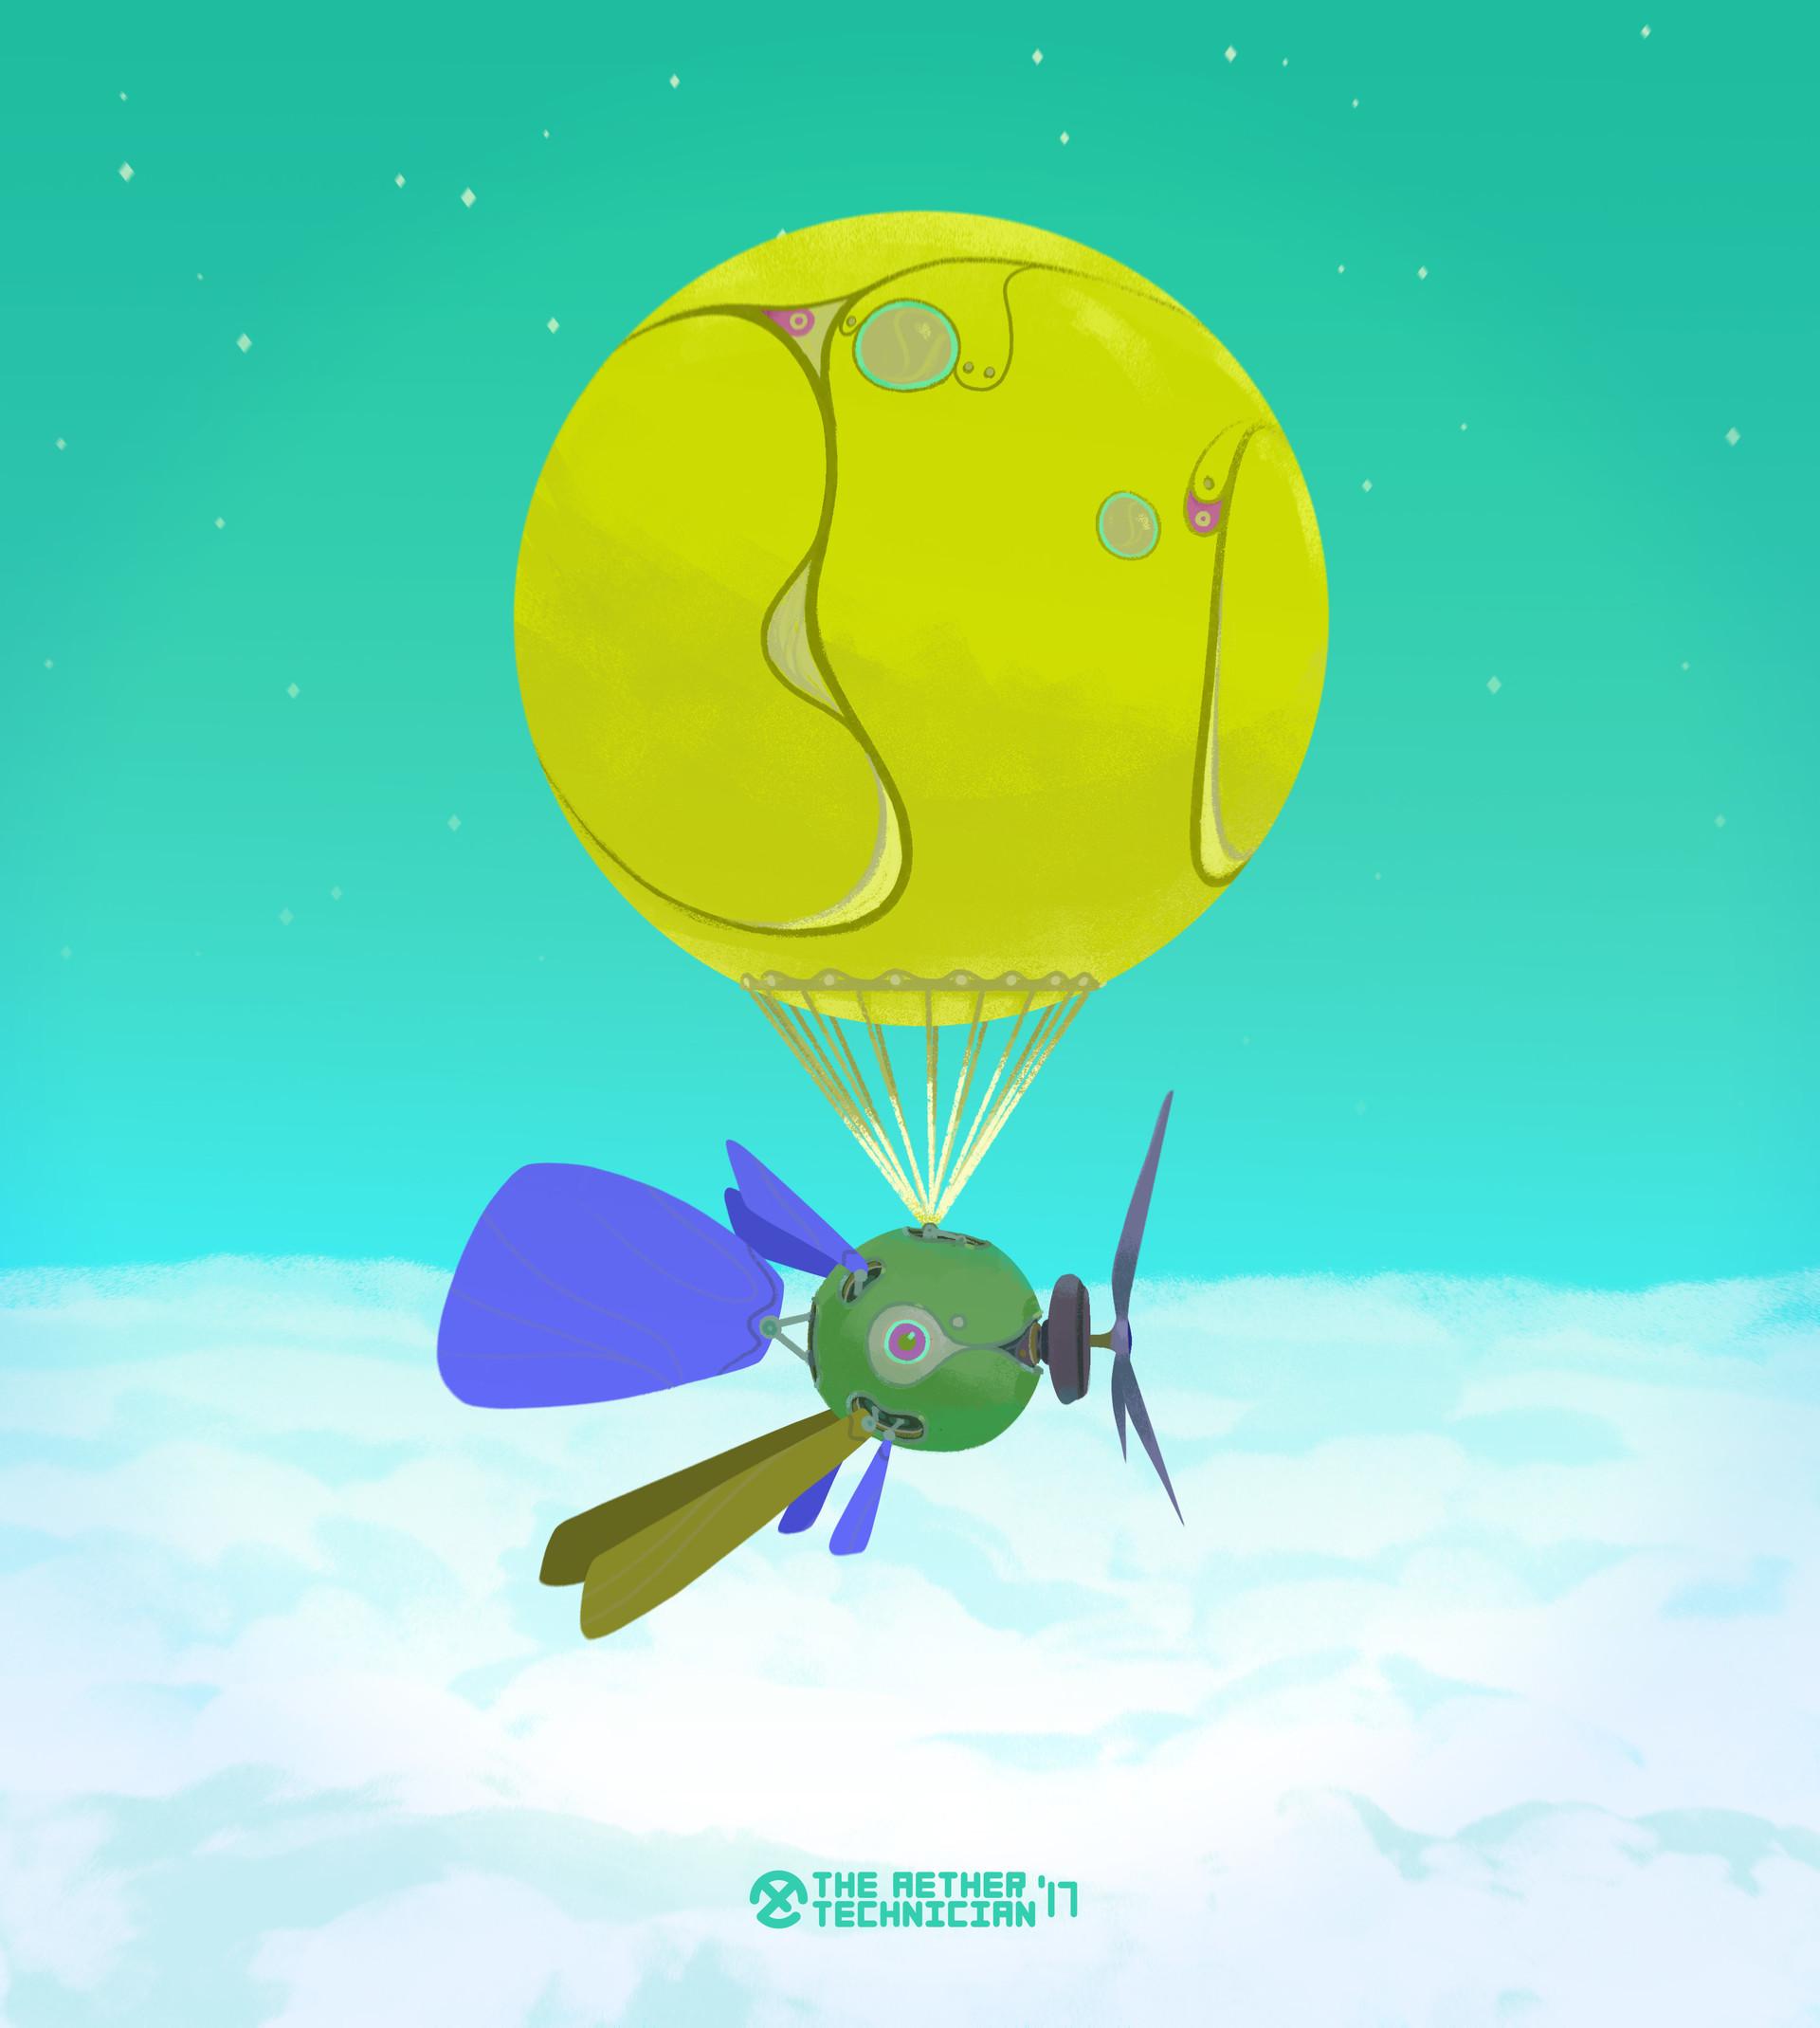 Samuel herb balloon drone